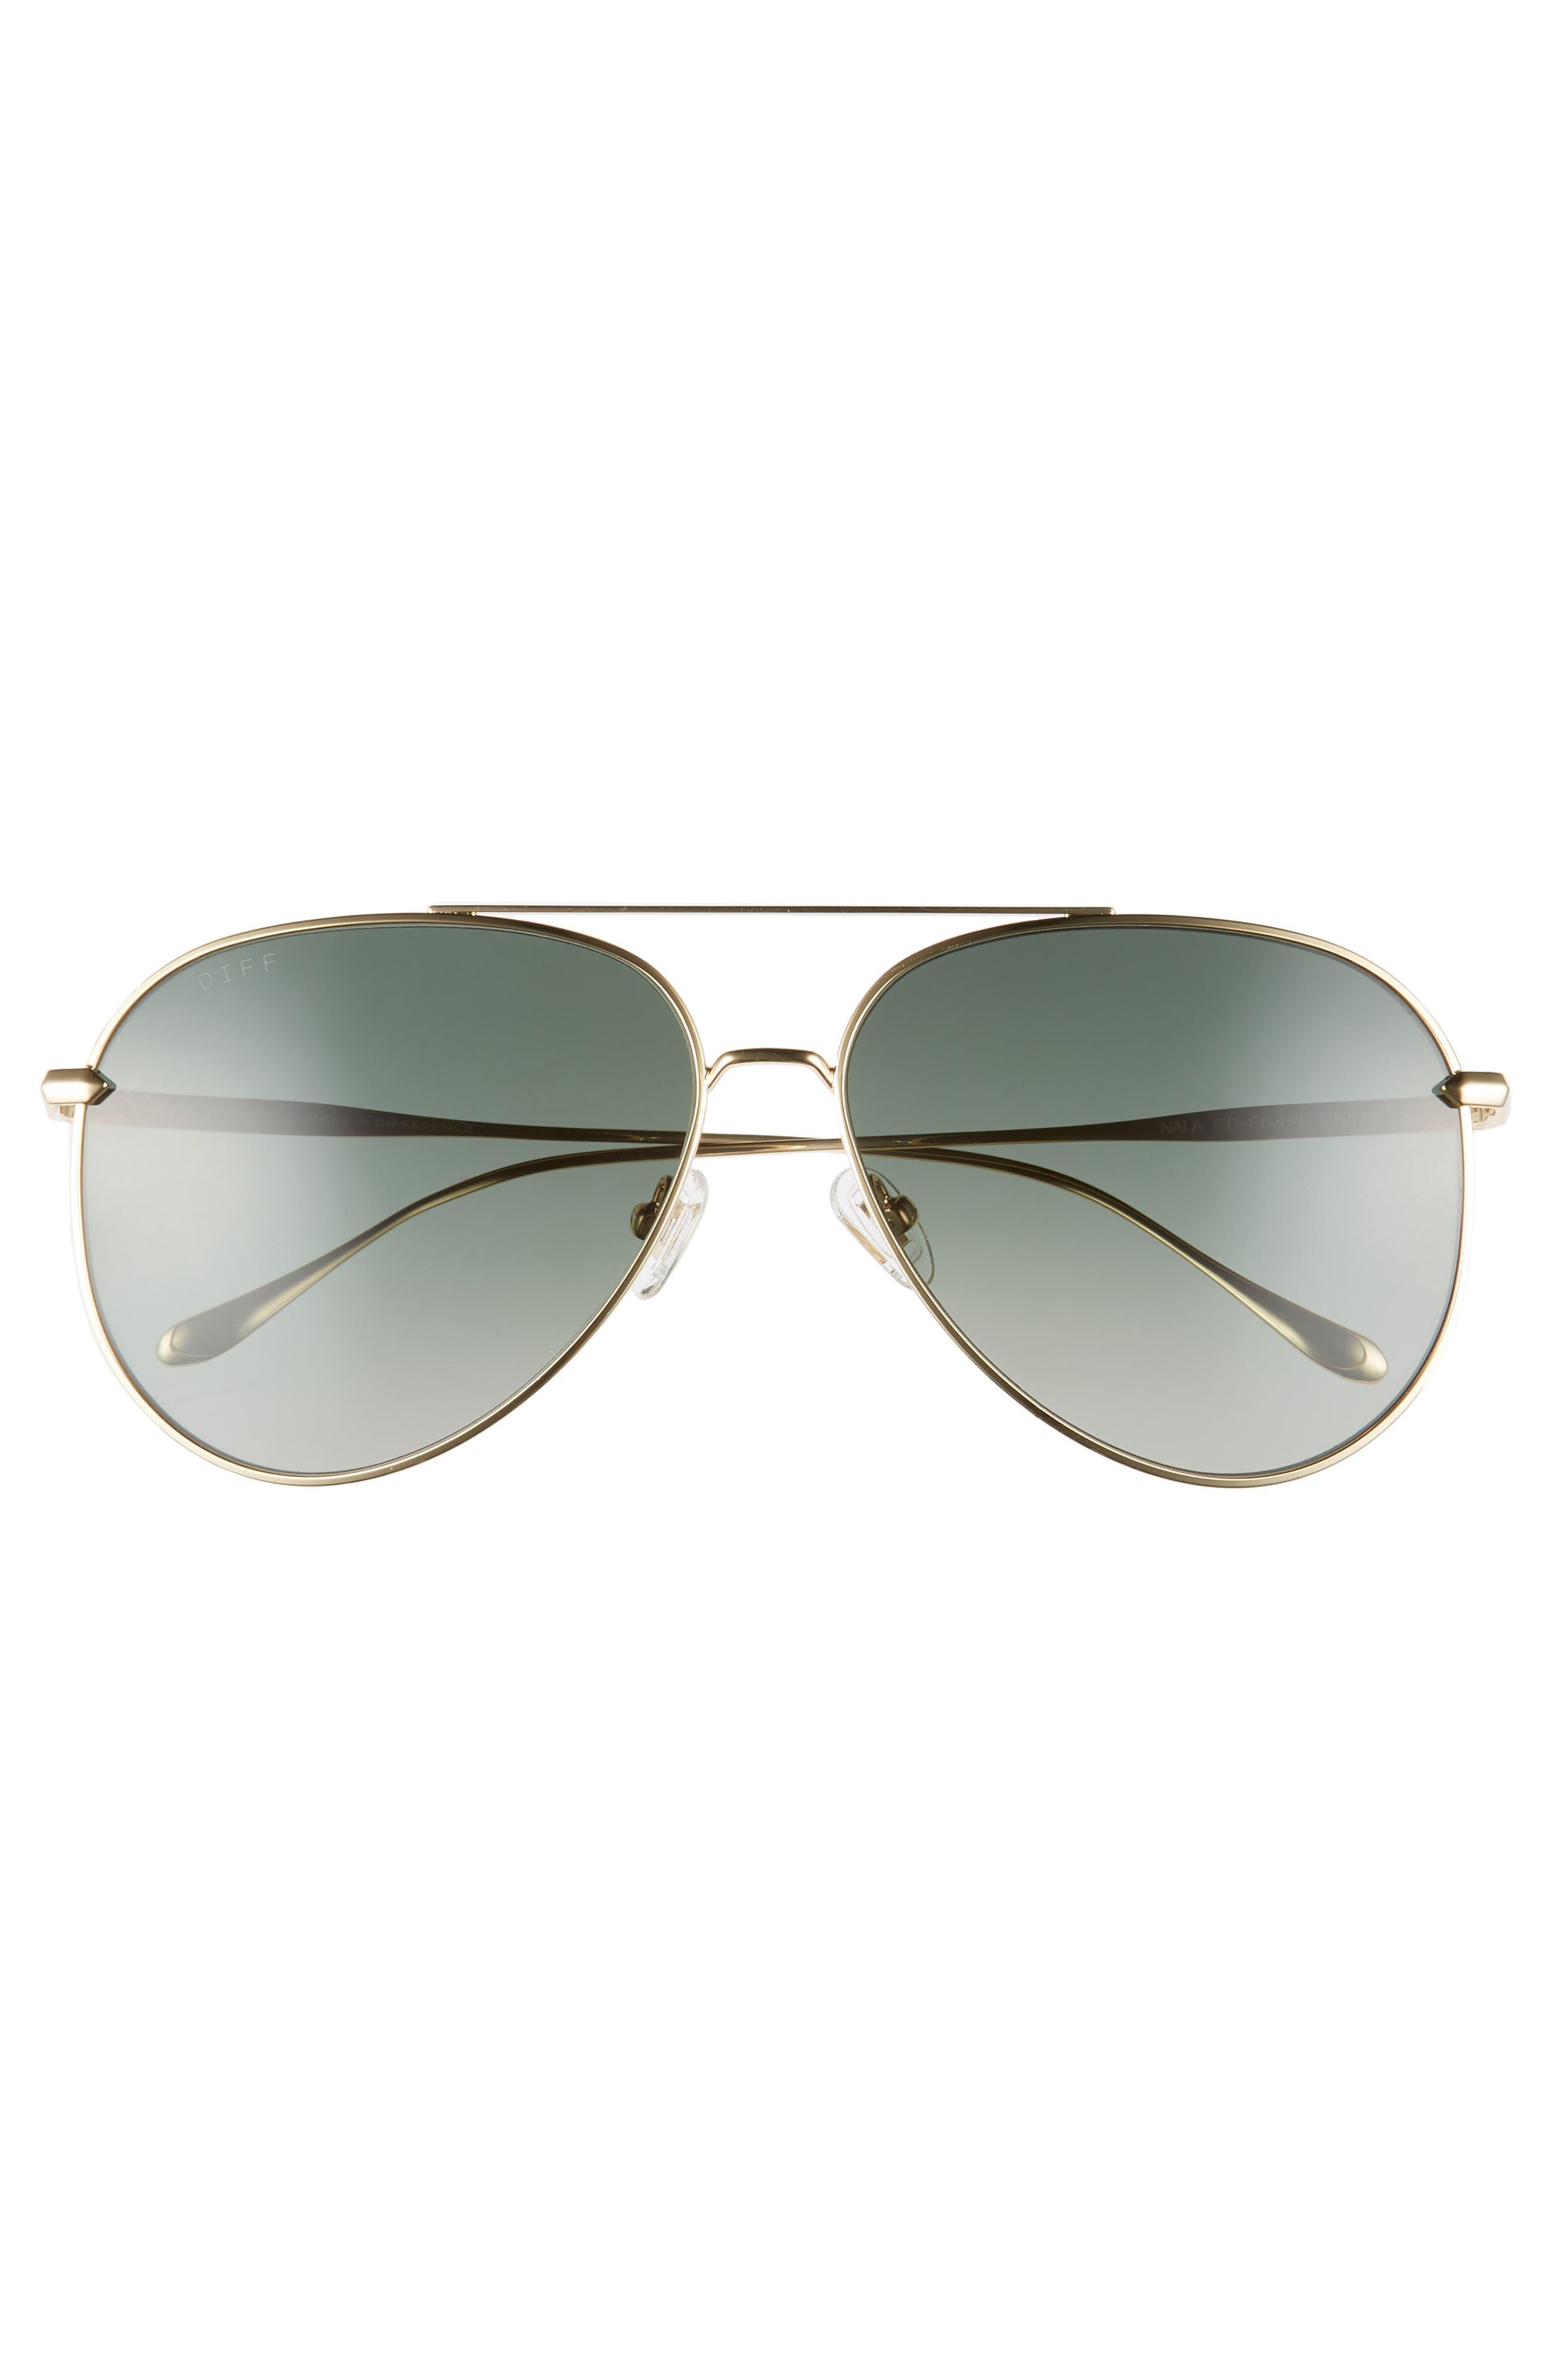 Nala 63mm Oversize Polarized Aviator Sunglasses,                             Alternate thumbnail 3, color,                             GOLD/ G15